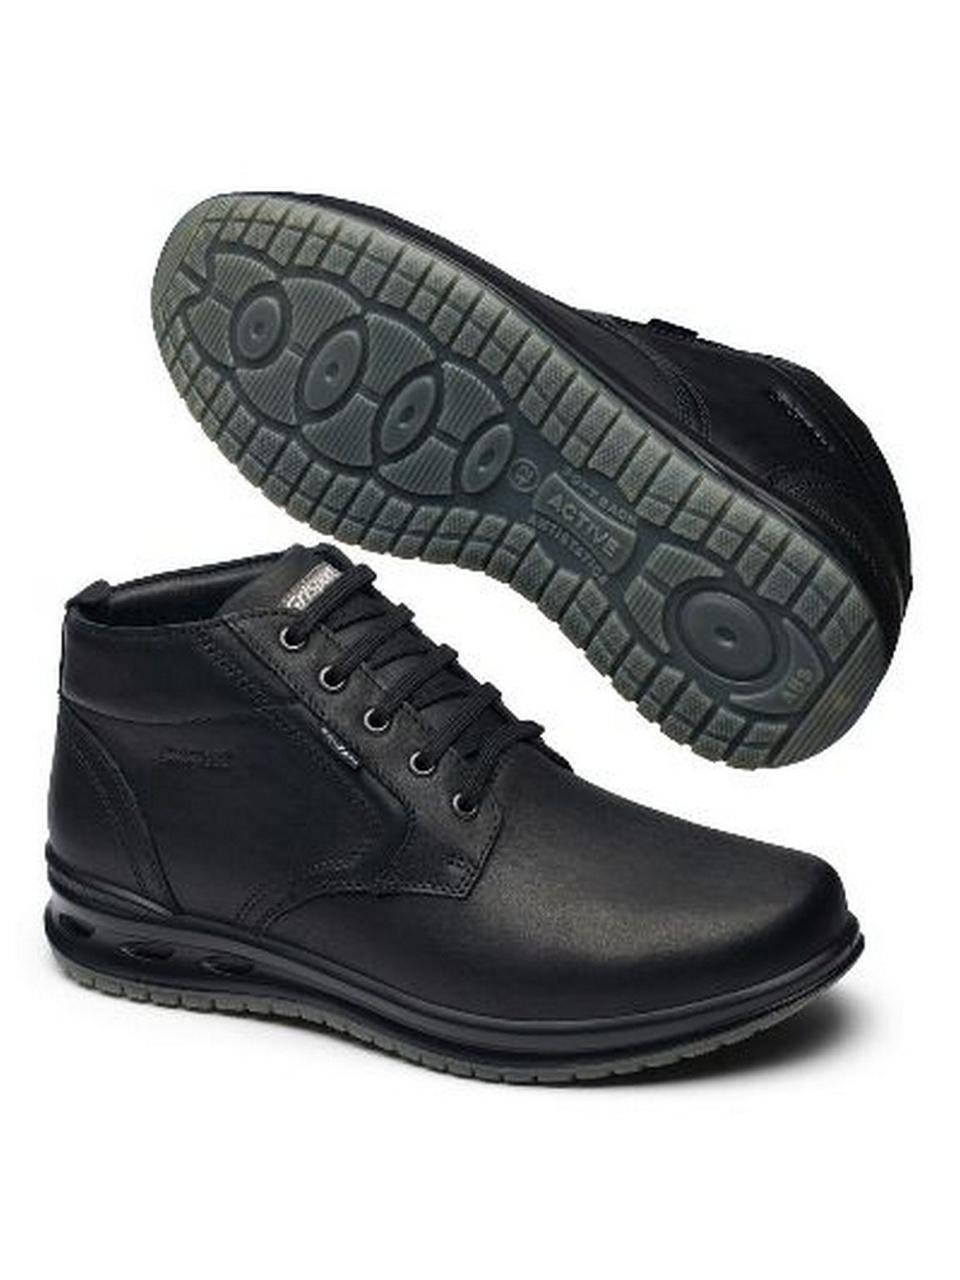 Ботинки Grisport 43015 чер. made in Italy